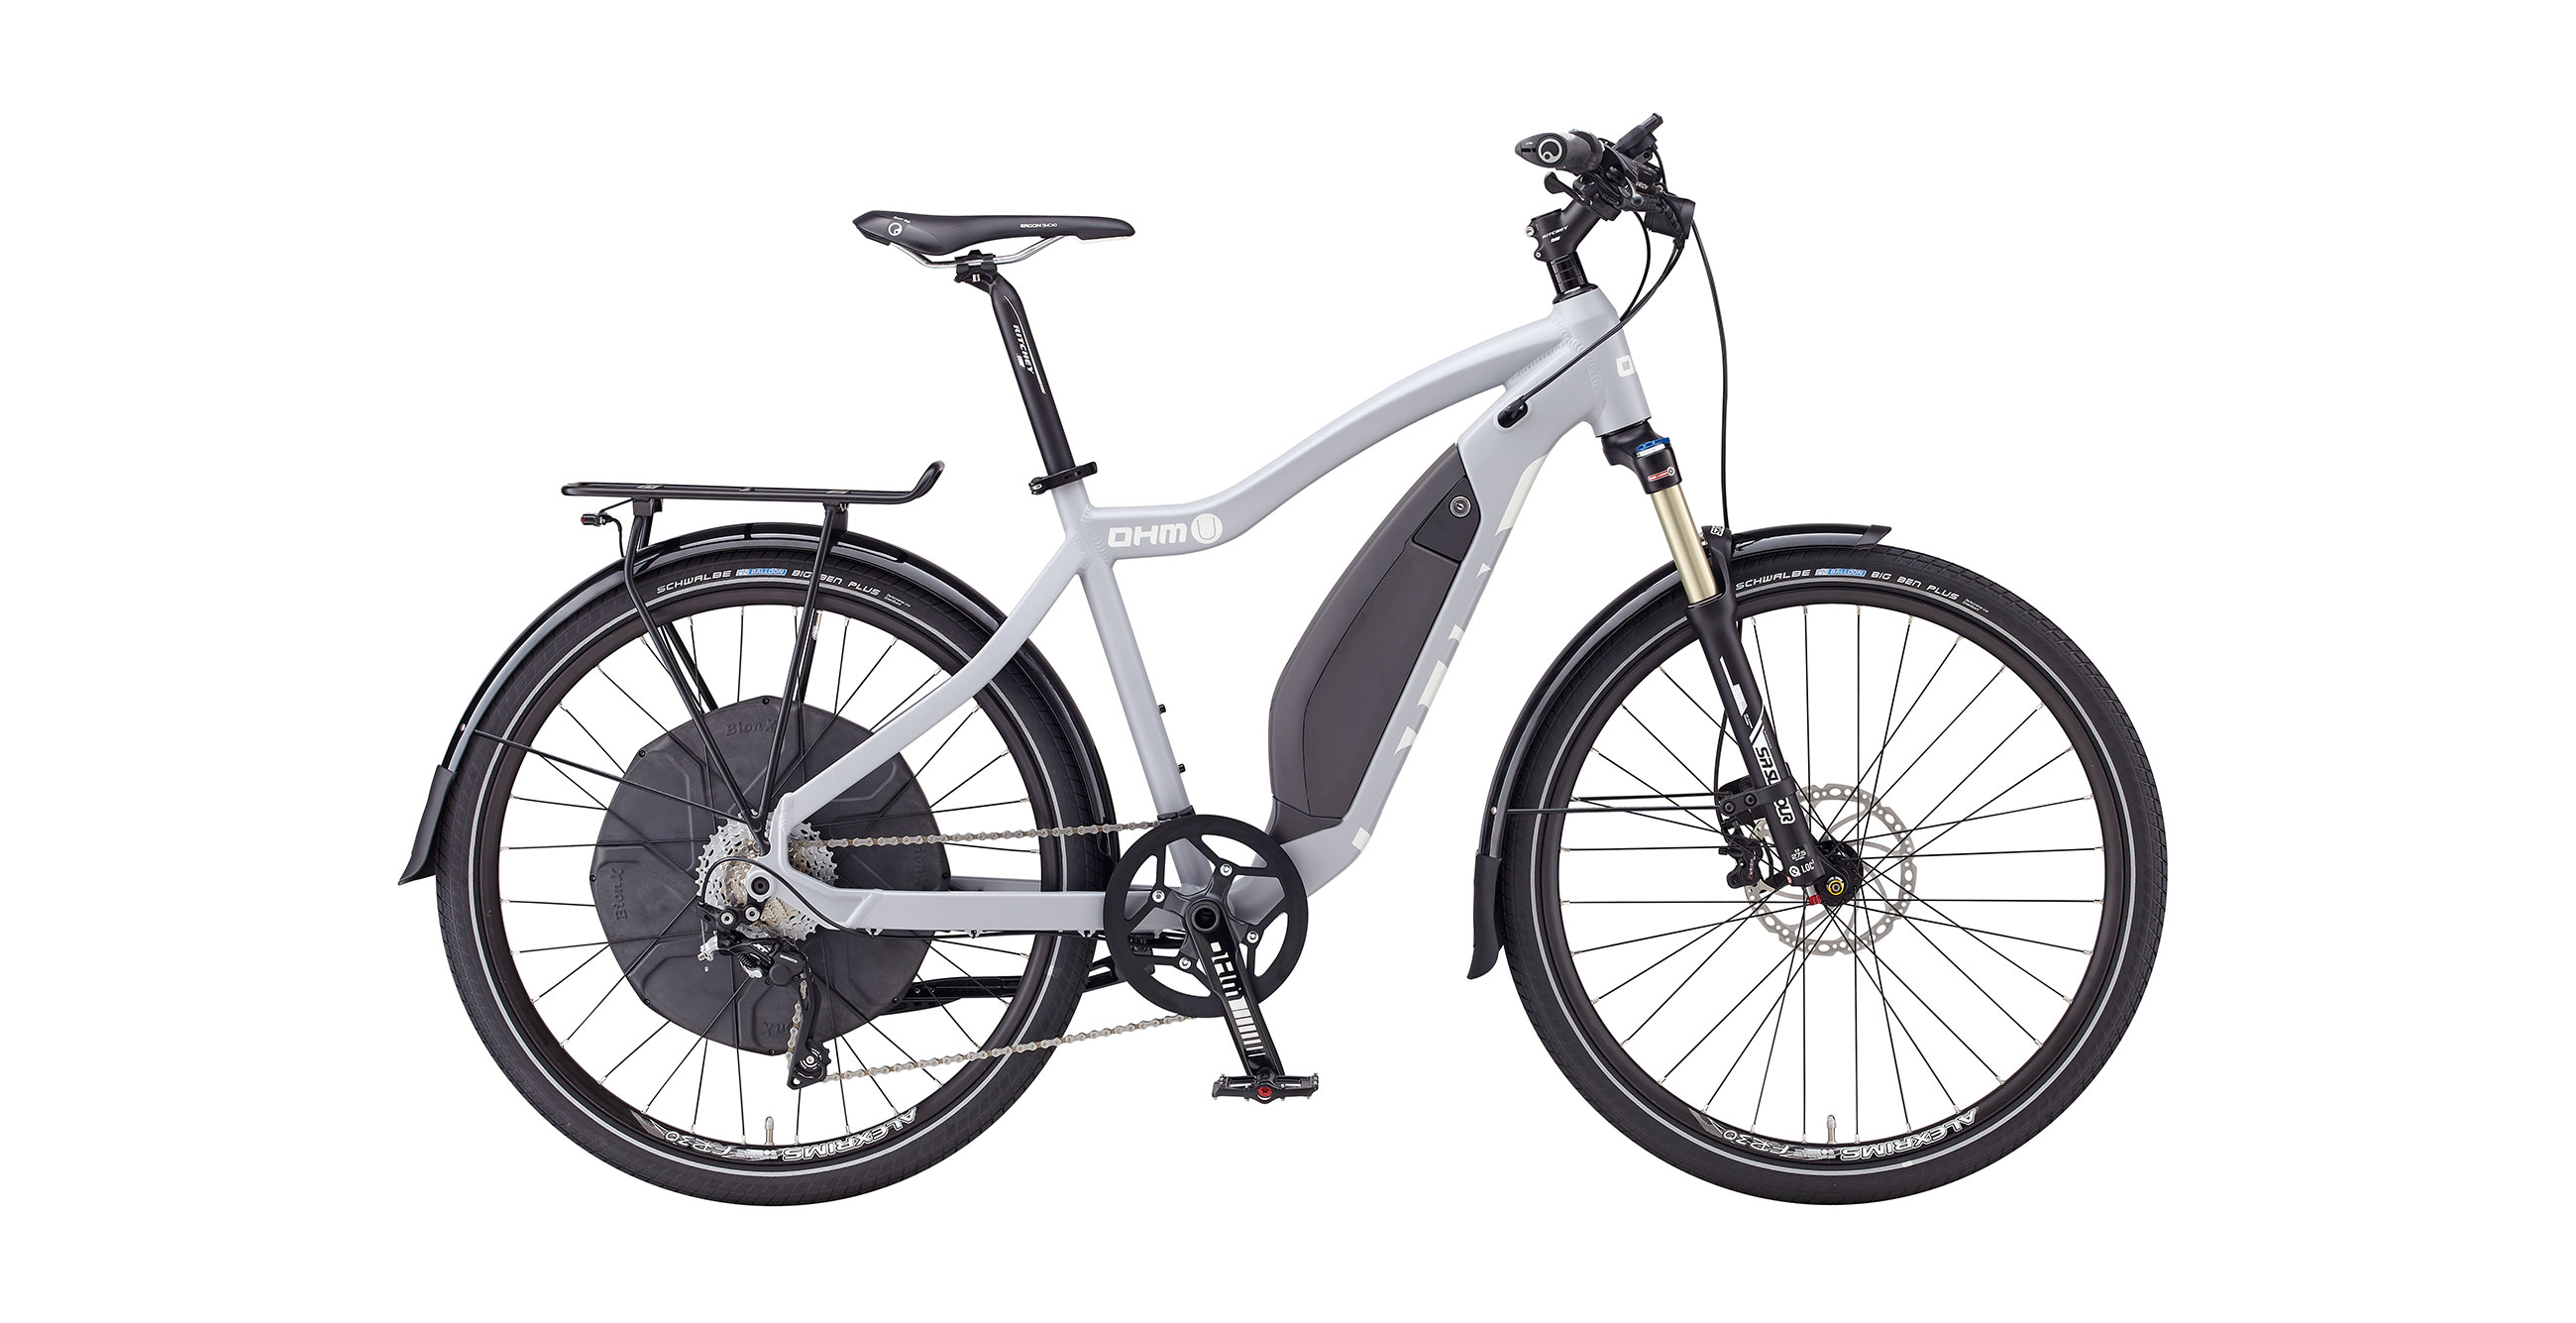 ohm cycles  u0026quot urban u0026quot